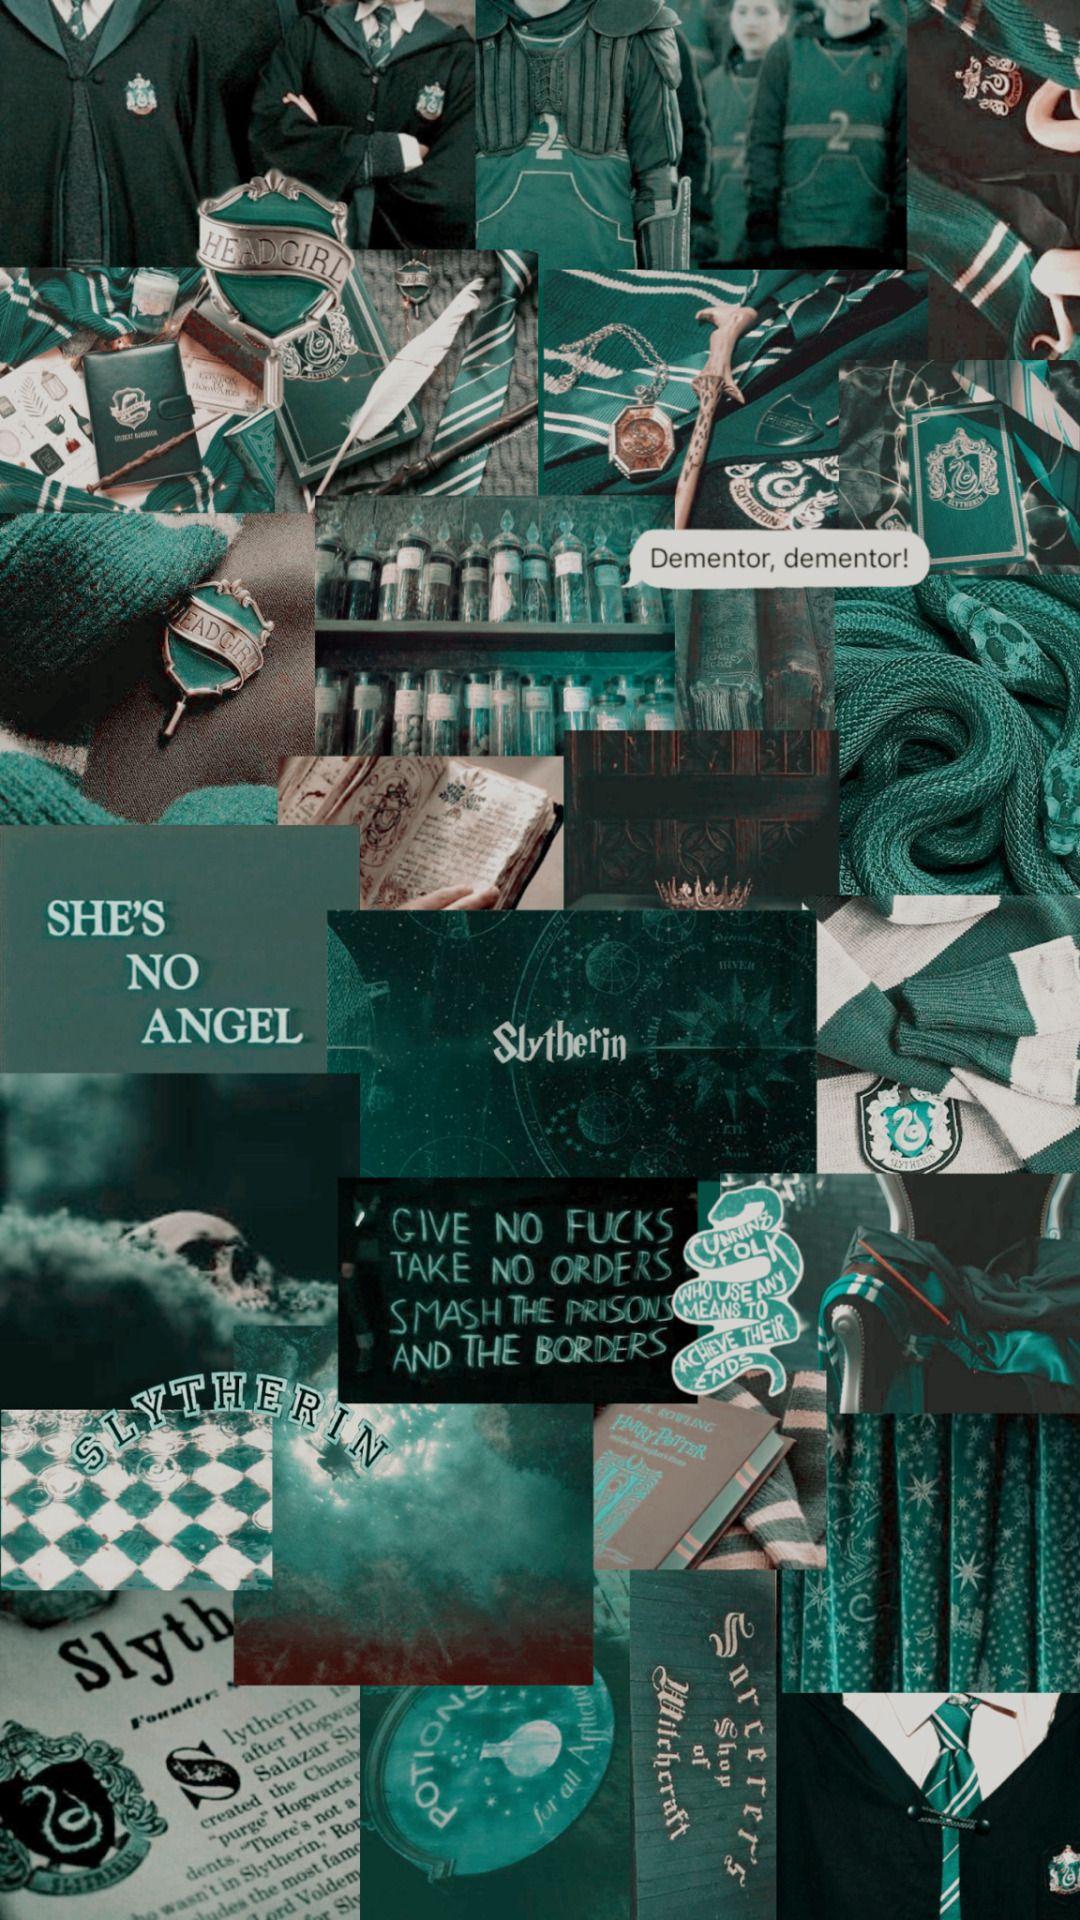 Pin By Shezza Malfoy On Harry Potter Wallpapers Harry Potter Aesthetic Harry Potter Wallpaper Slytherin Wallpaper